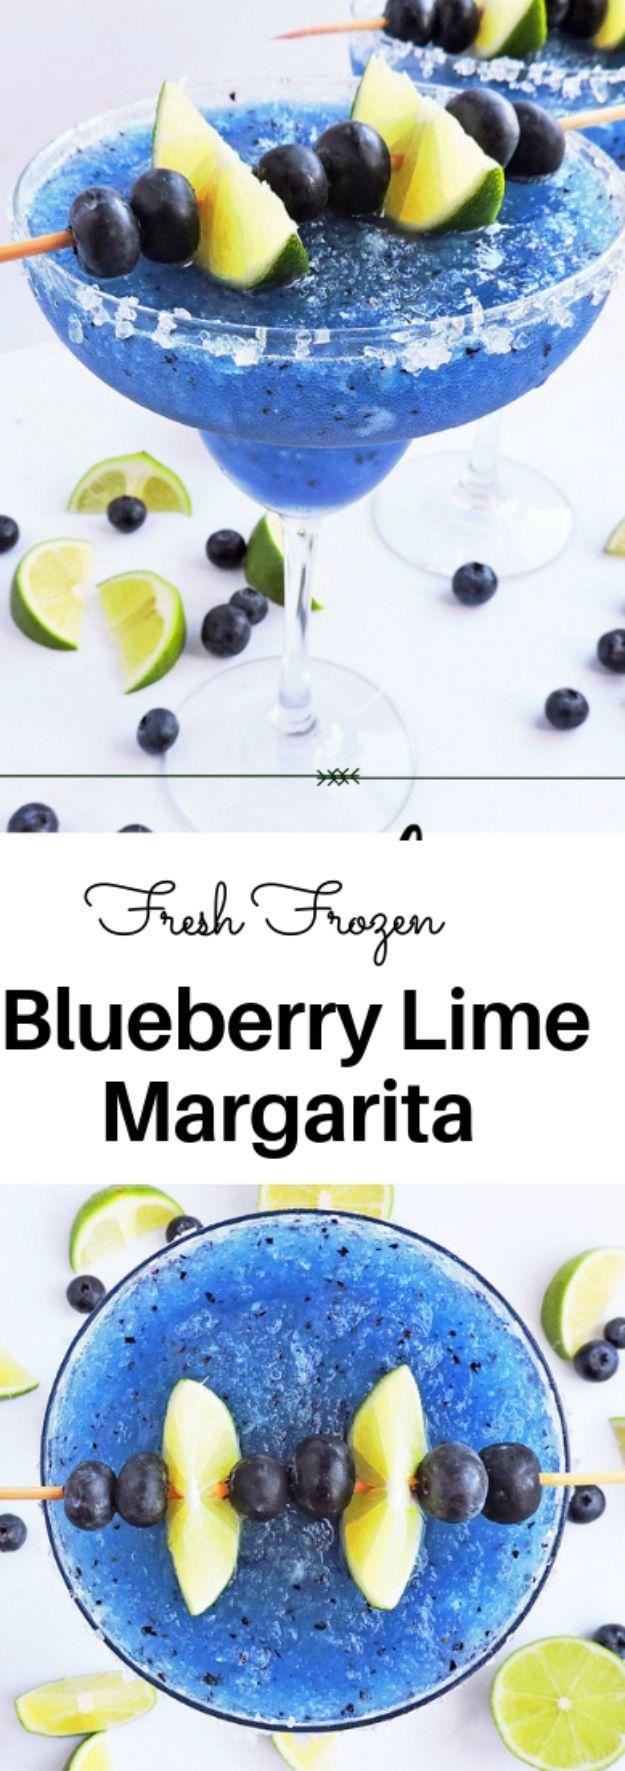 Margarita Recipes - Fresh Frozen Blueberry Lime Margarita - Drink Recipes for a Party - Recipe Ideas for Blender Margaritas - Lime, Strawberry, Fruit | Easy Drinks With Tequila